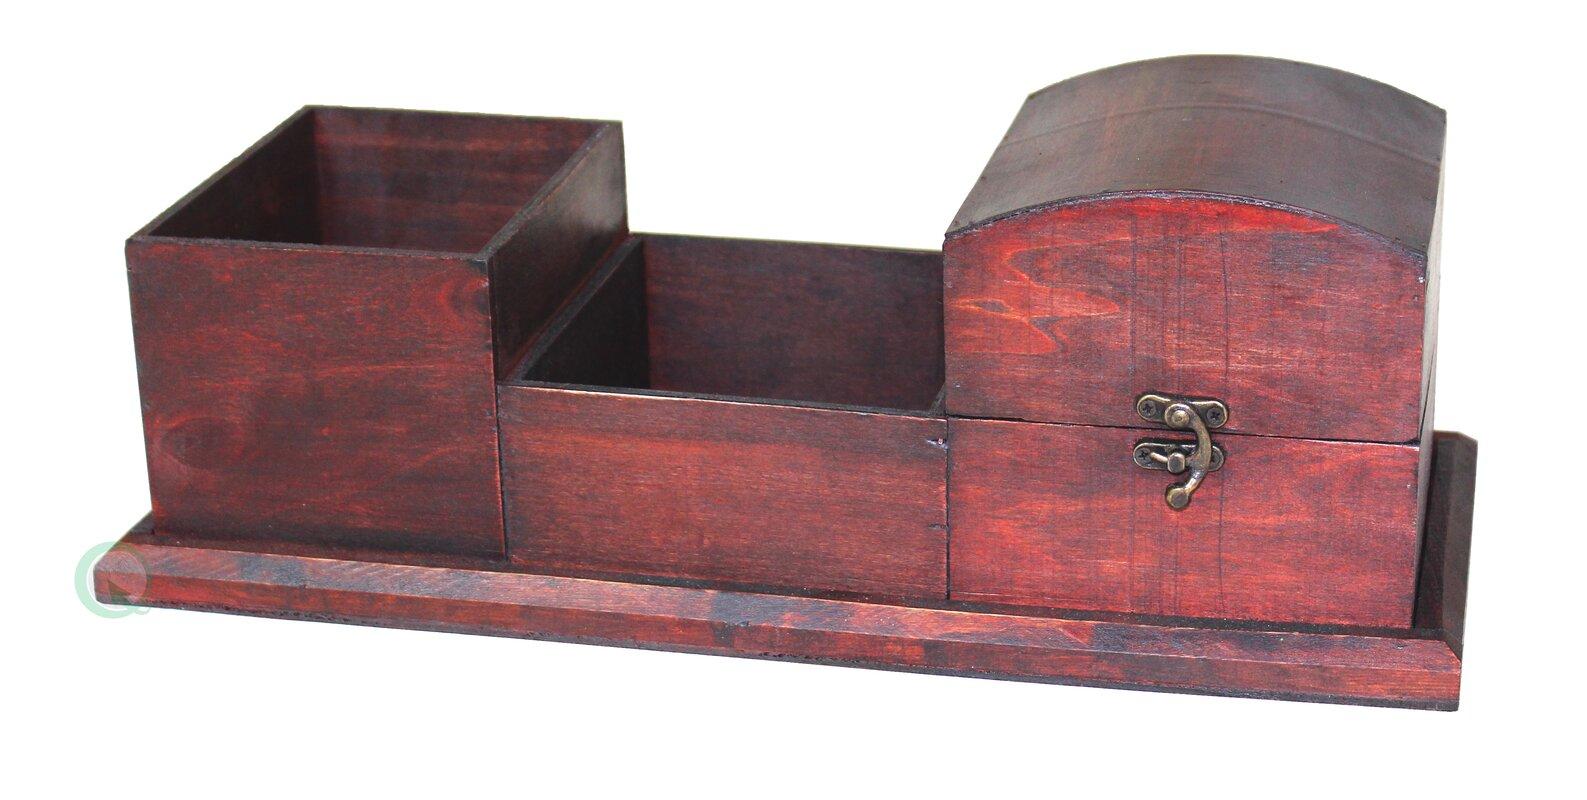 Antique Wood Desk Organizer - Quickway Imports Antique Wood Desk Organizer & Reviews Wayfair